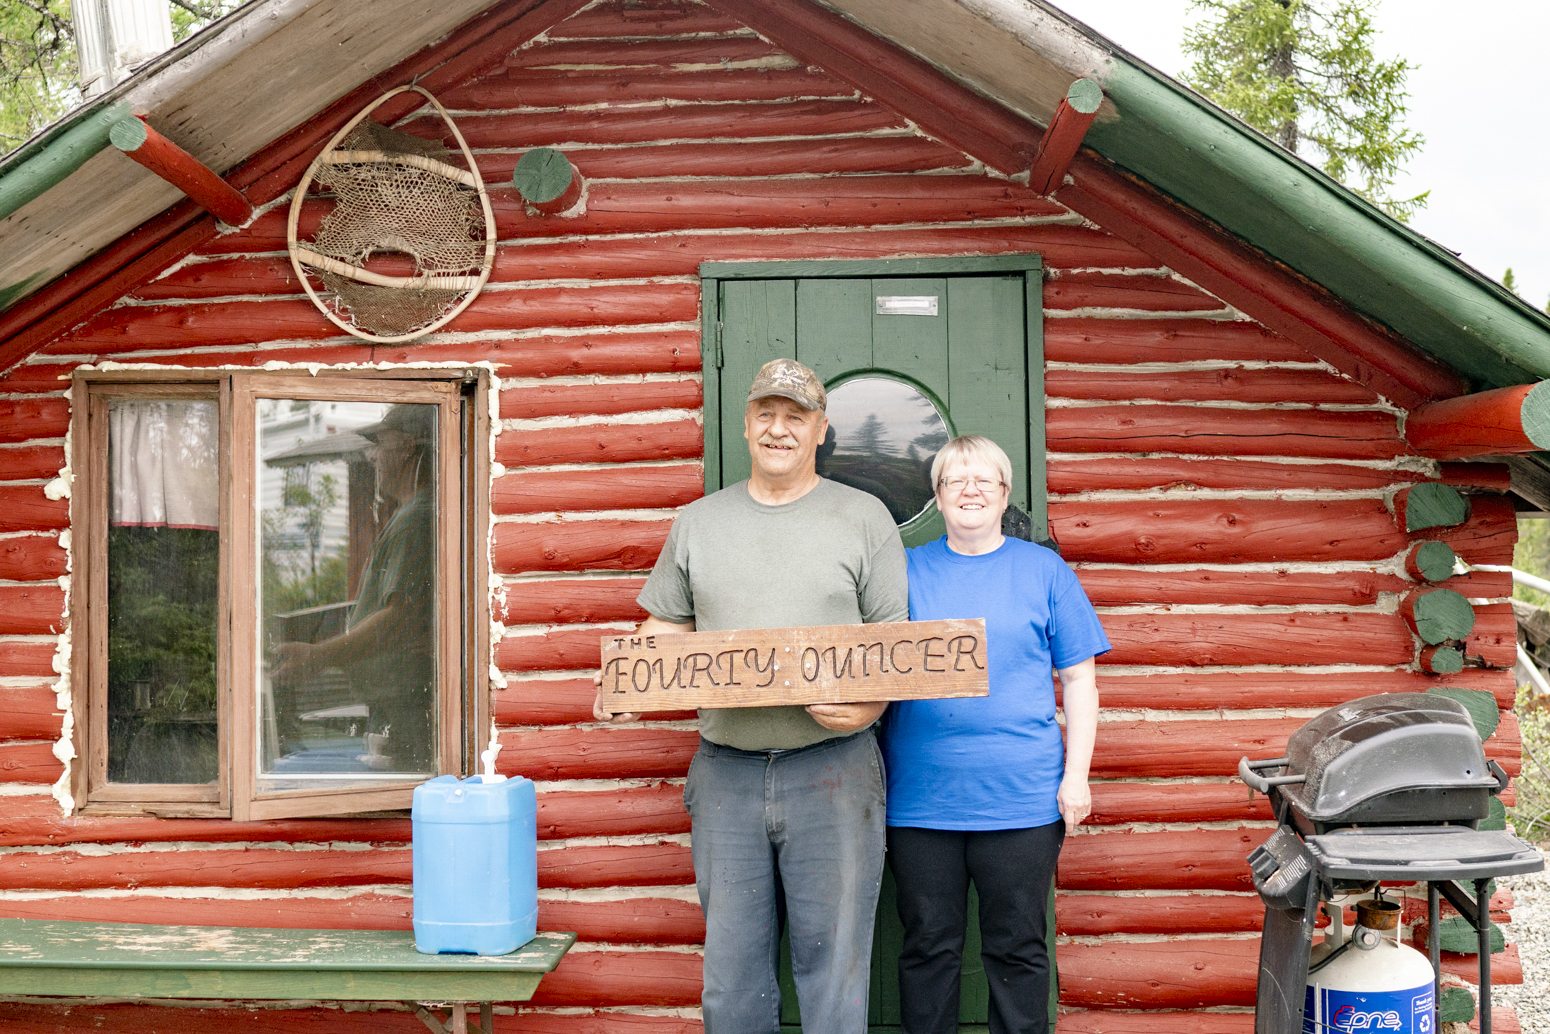 Fourty Ouncer Cabin